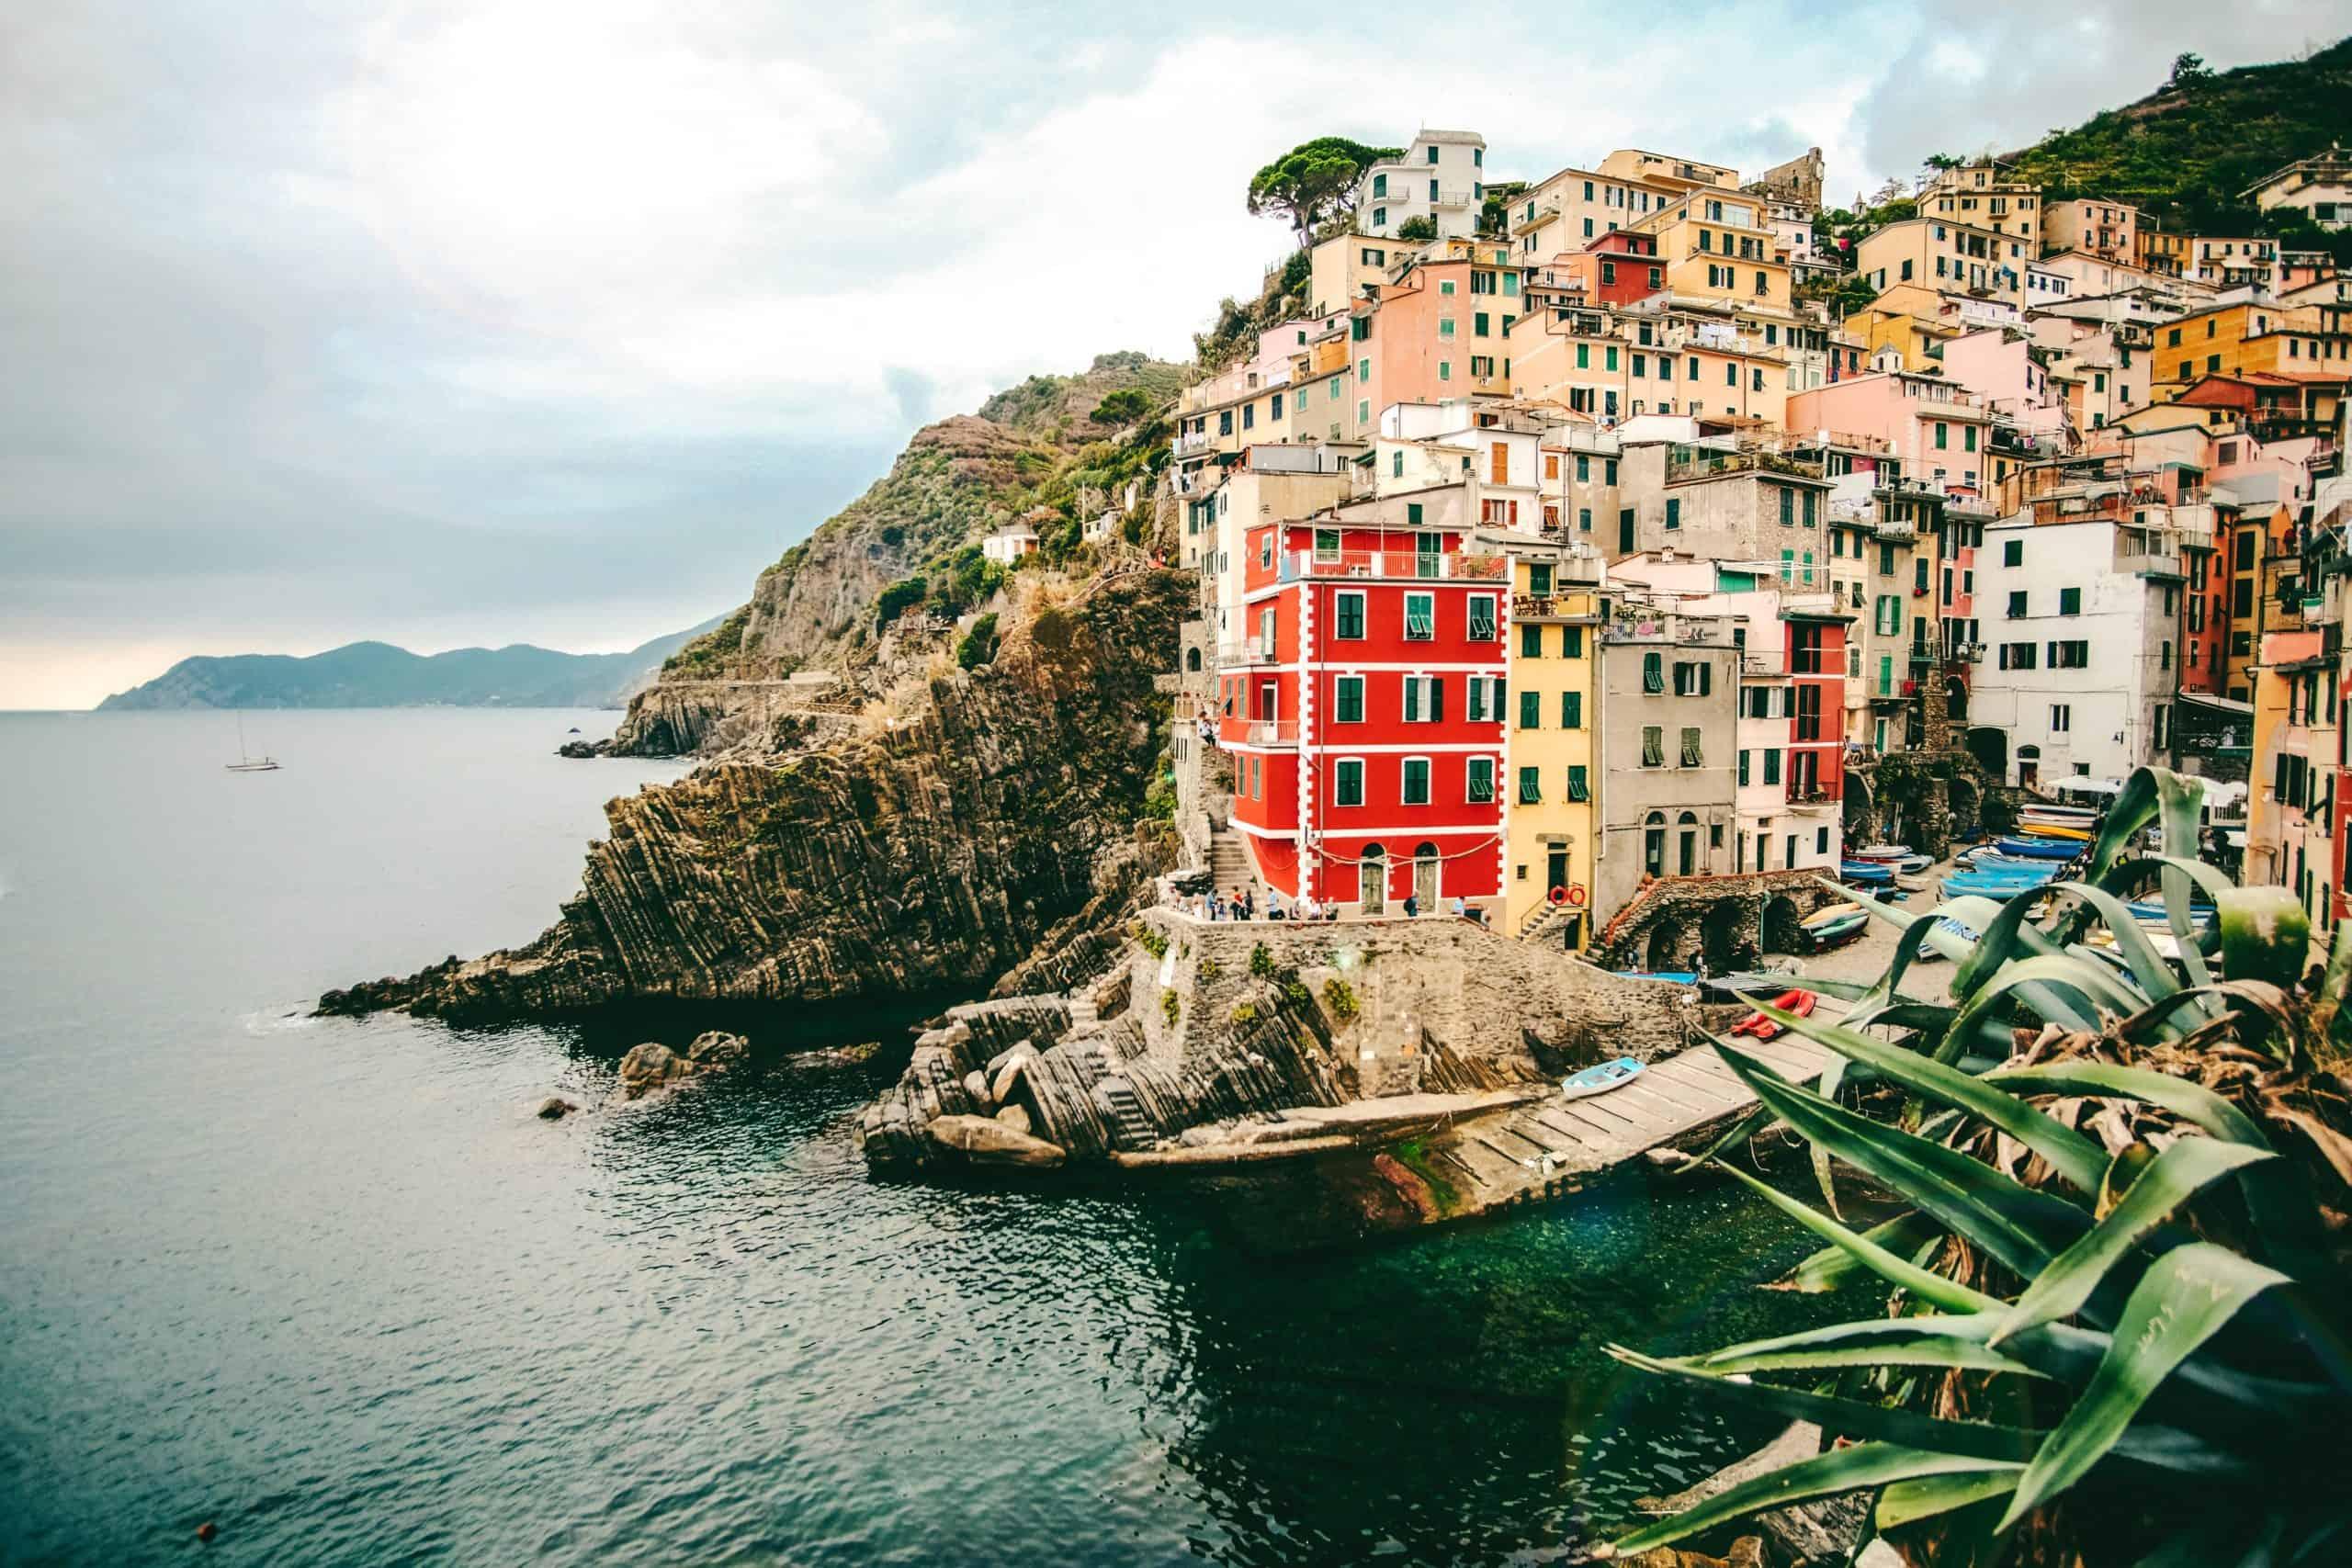 Vegan reisen in Italien - Reisewörterbuch